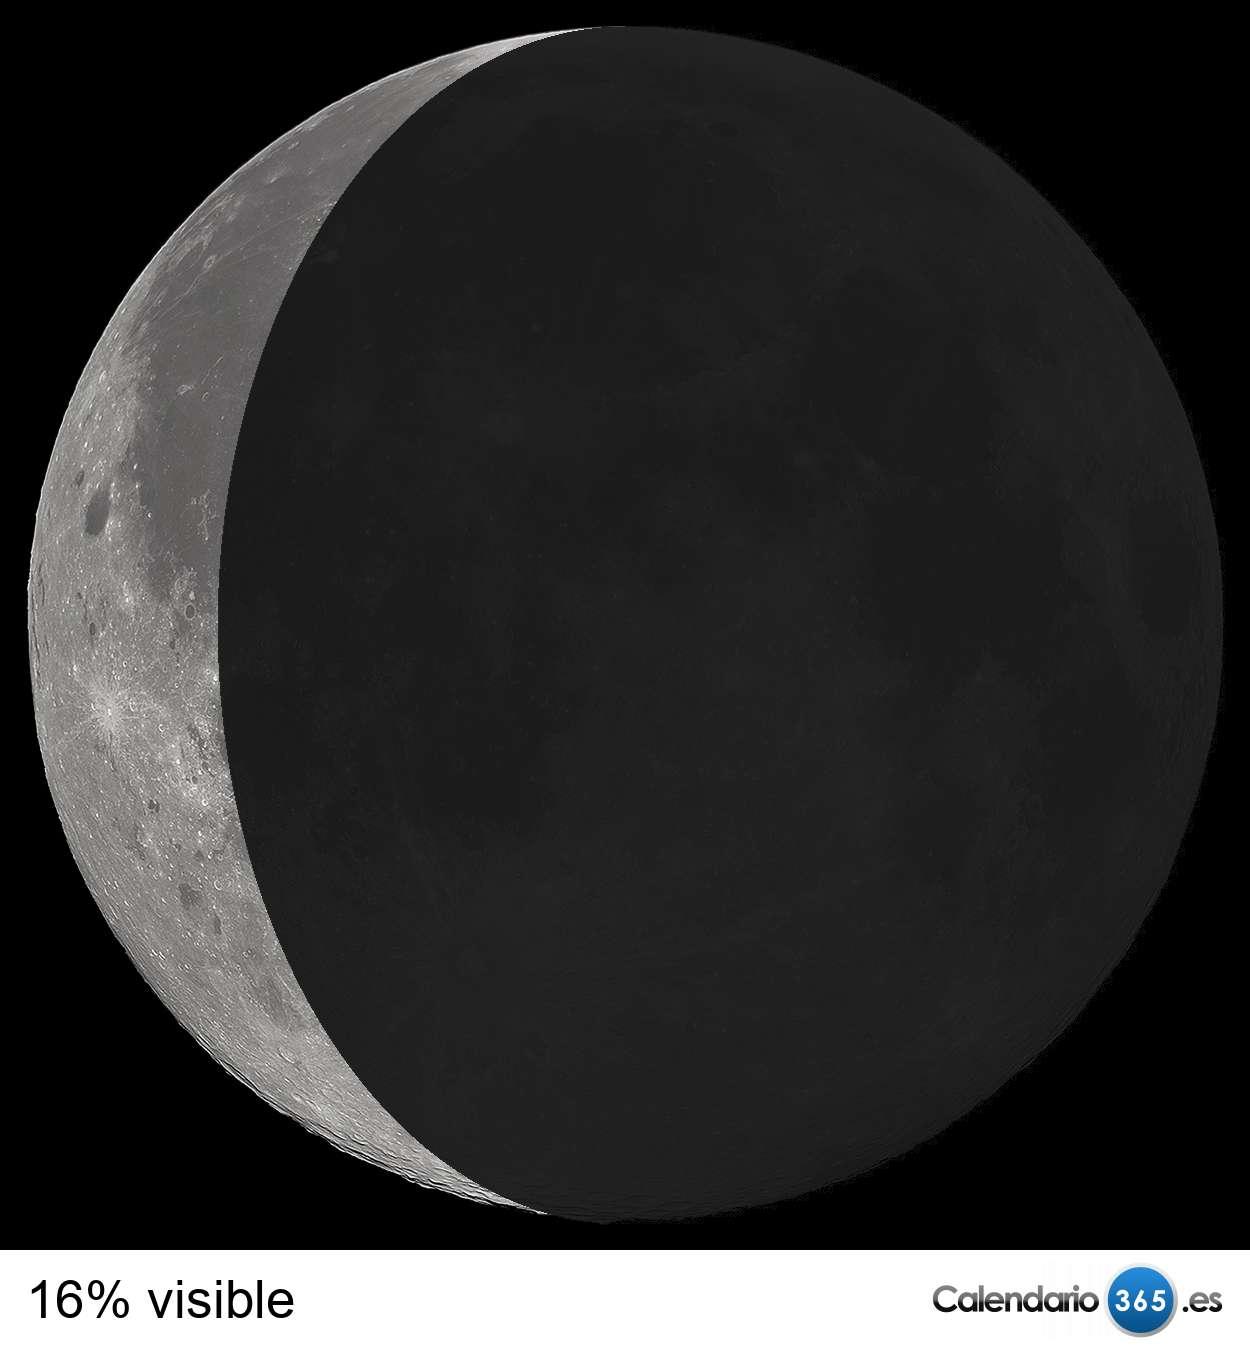 Fases de la luna 2019 & 2020